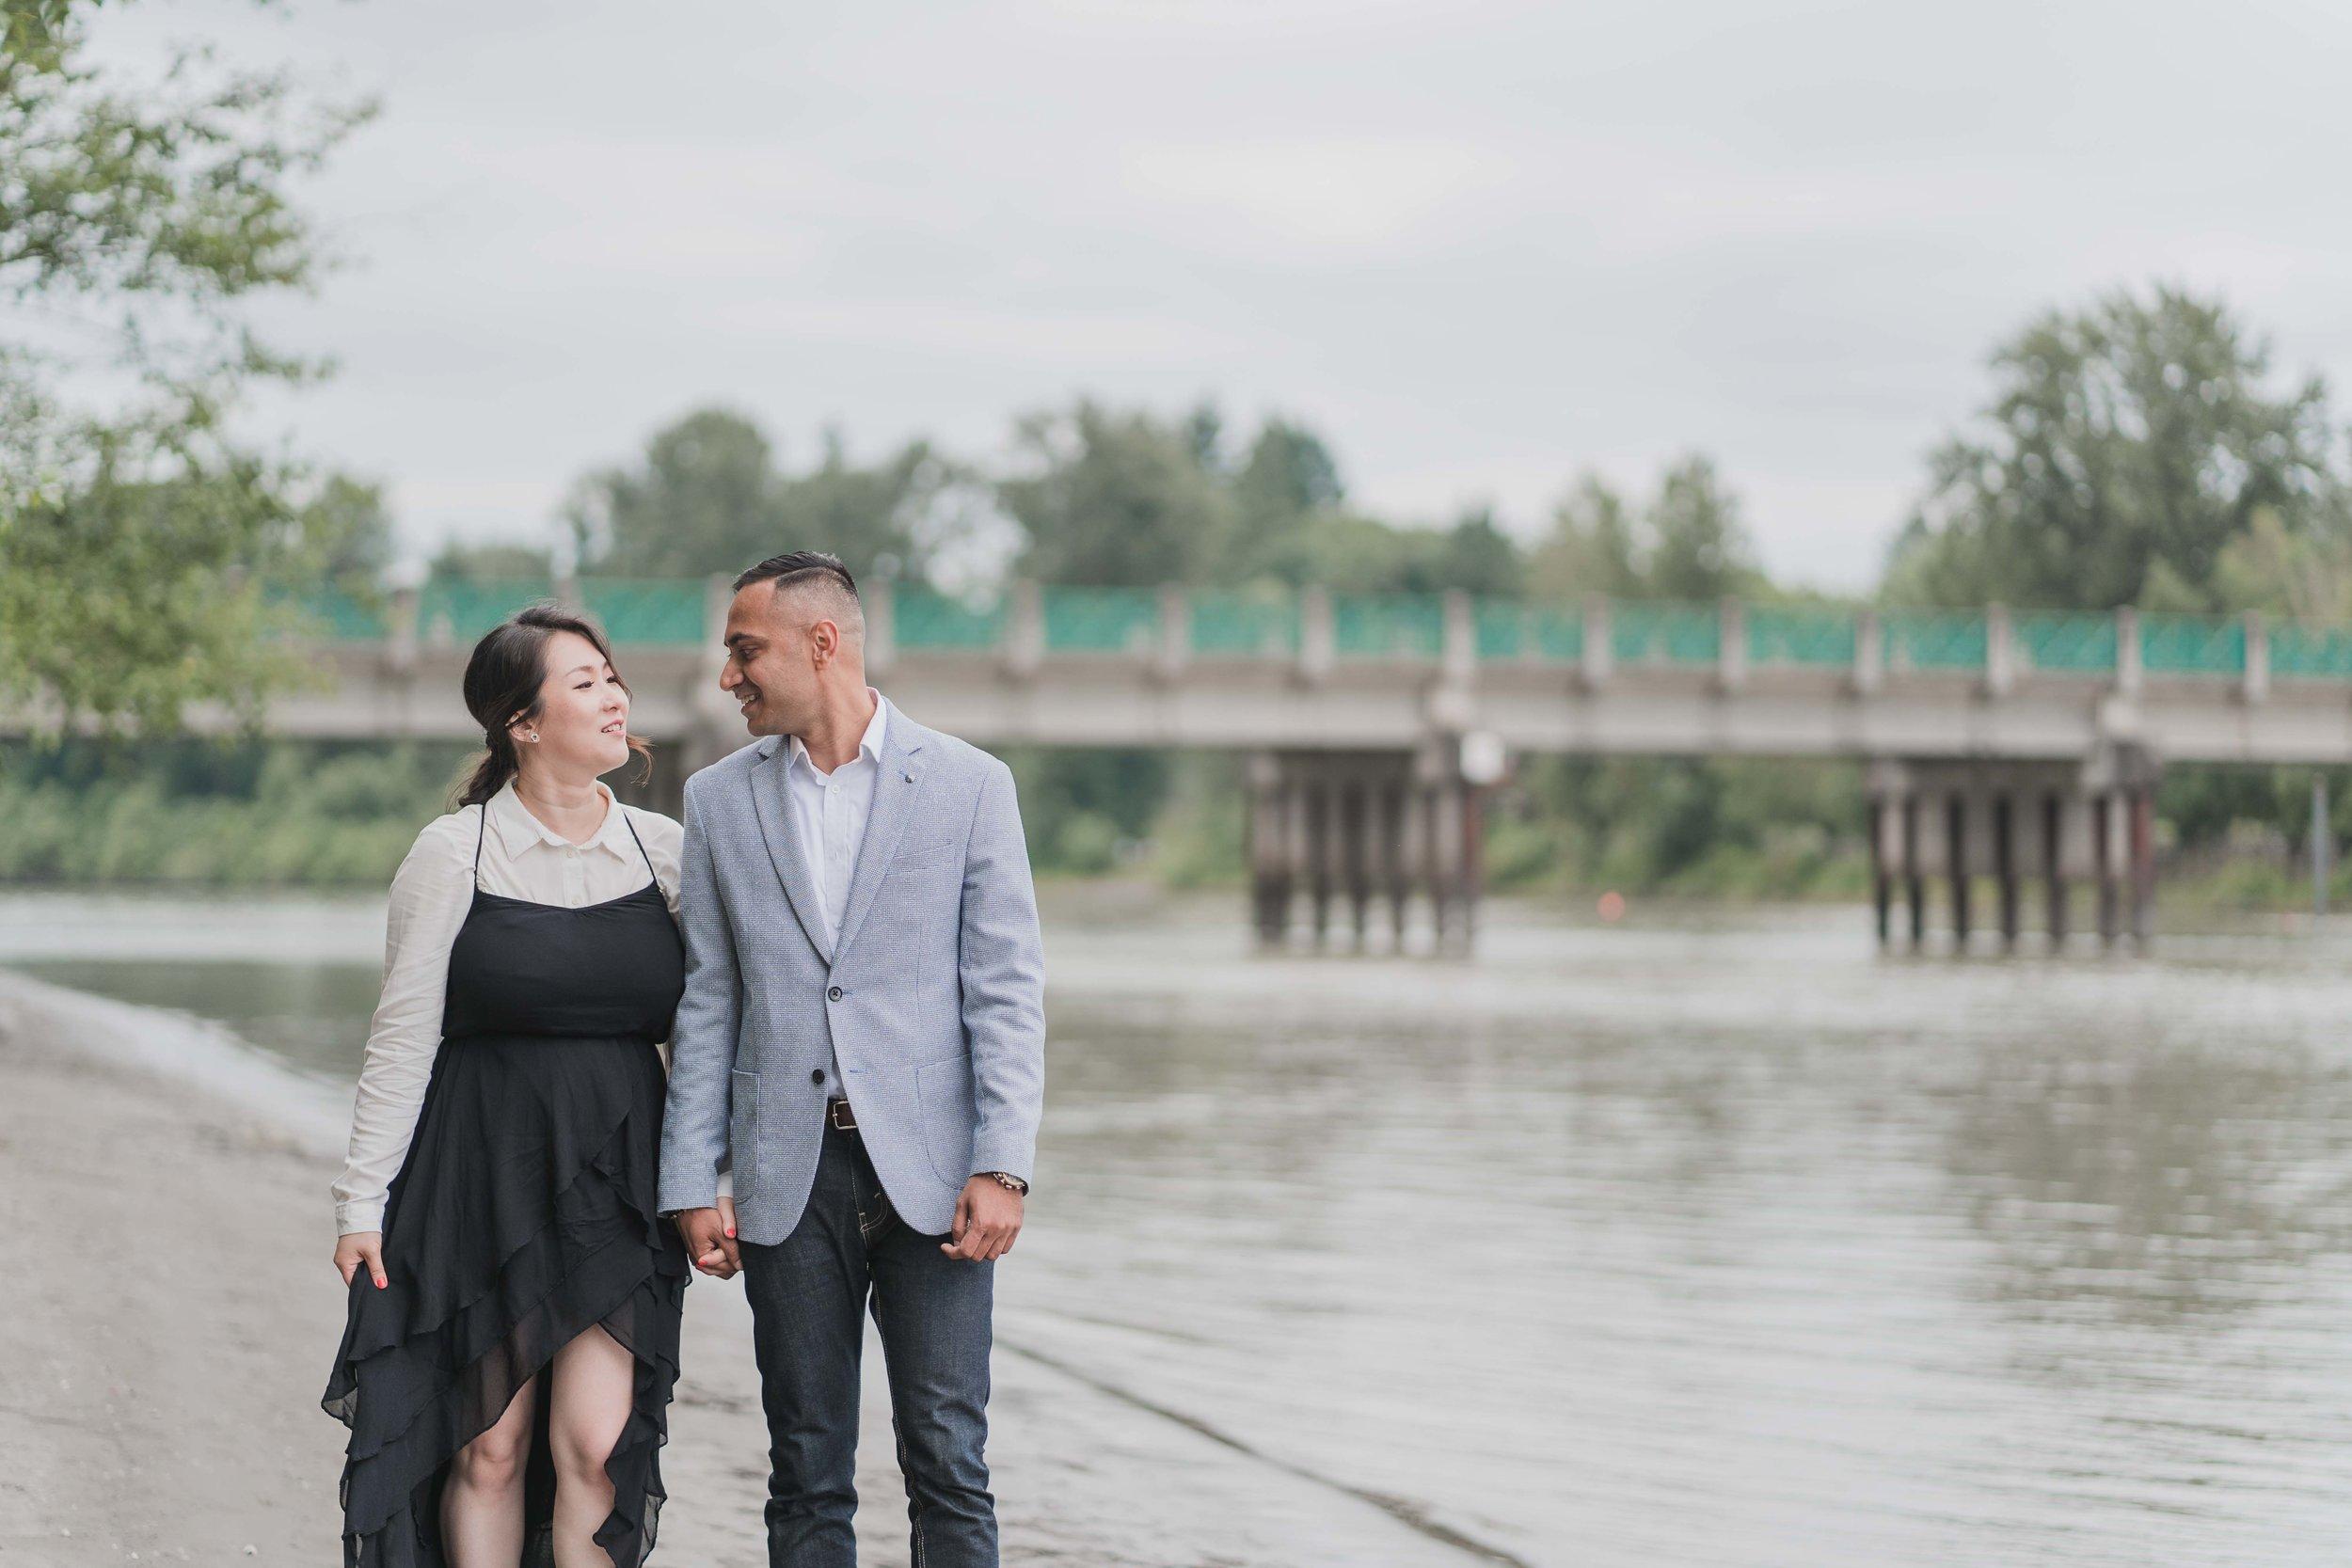 20190622 - Monika & Johnson Engagement - 0121.jpg